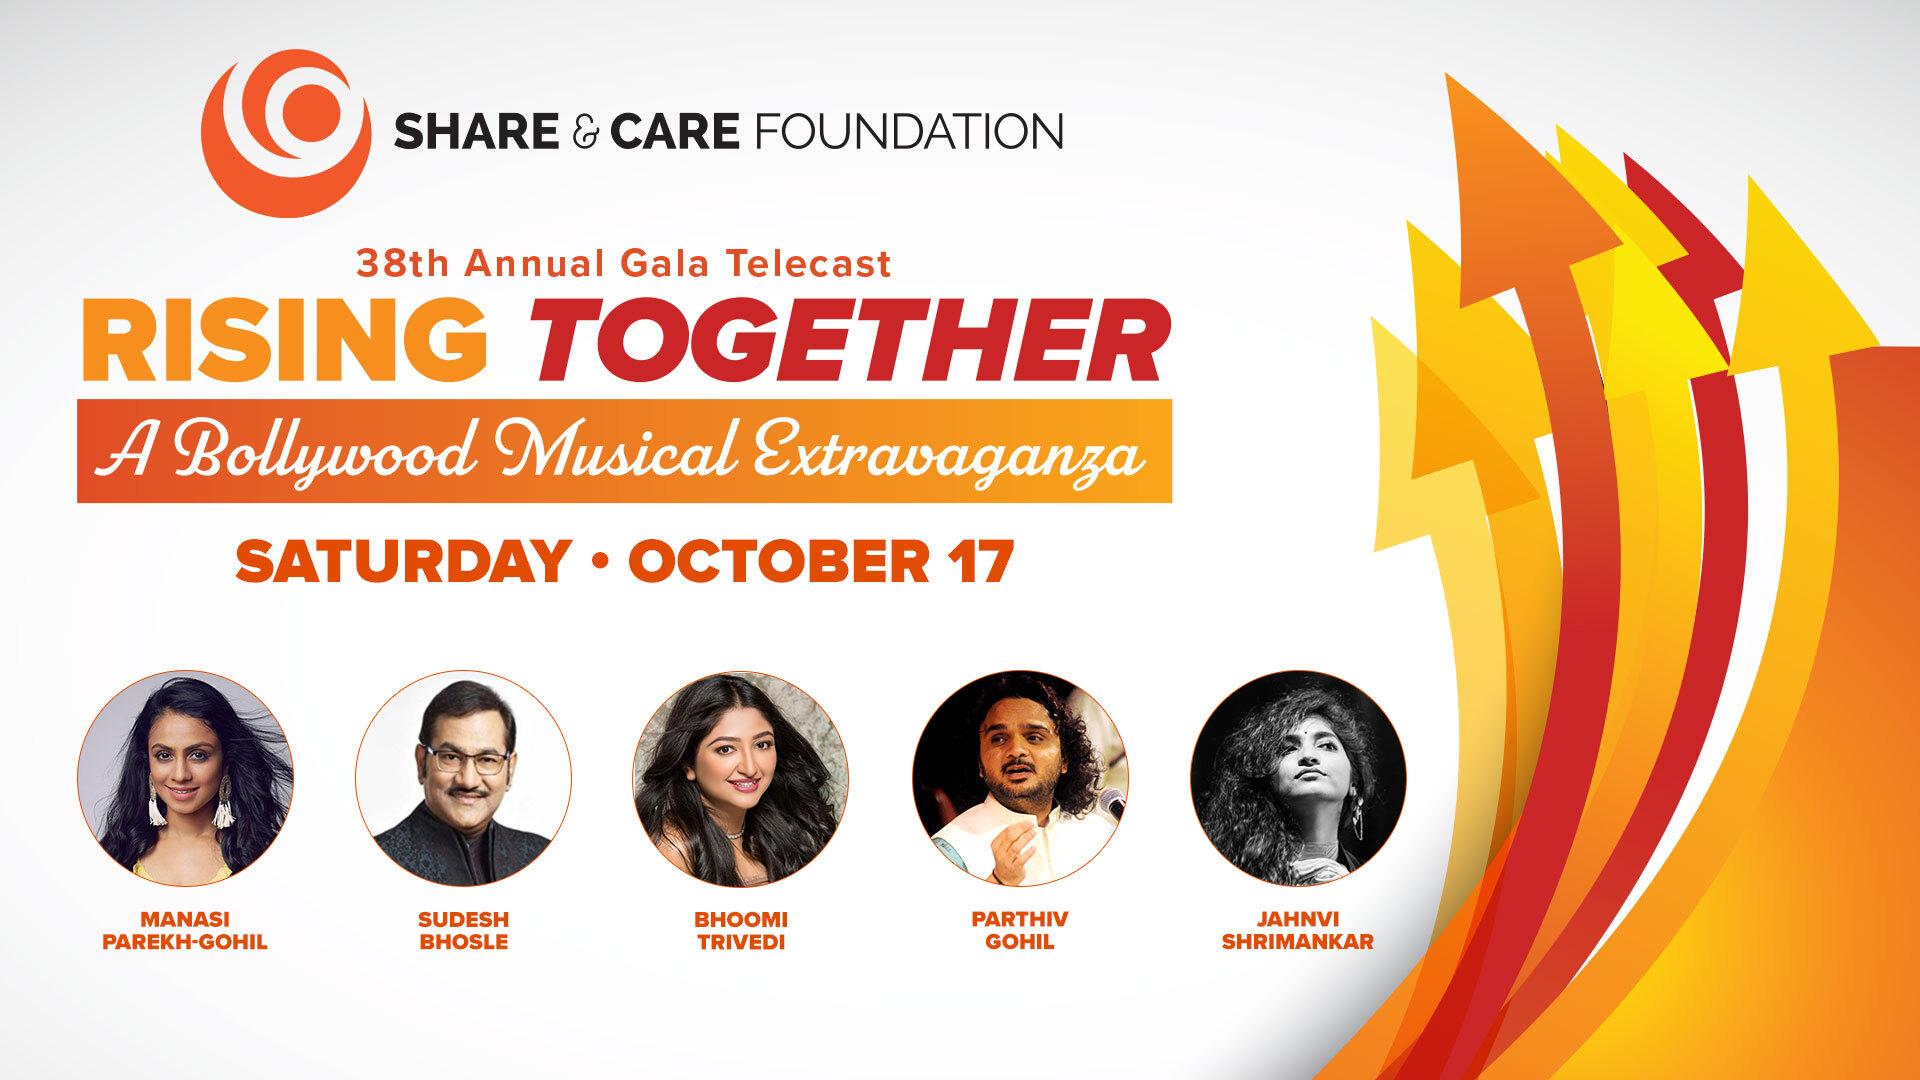 Rising Together: A Bollywood Musical Extravaganza